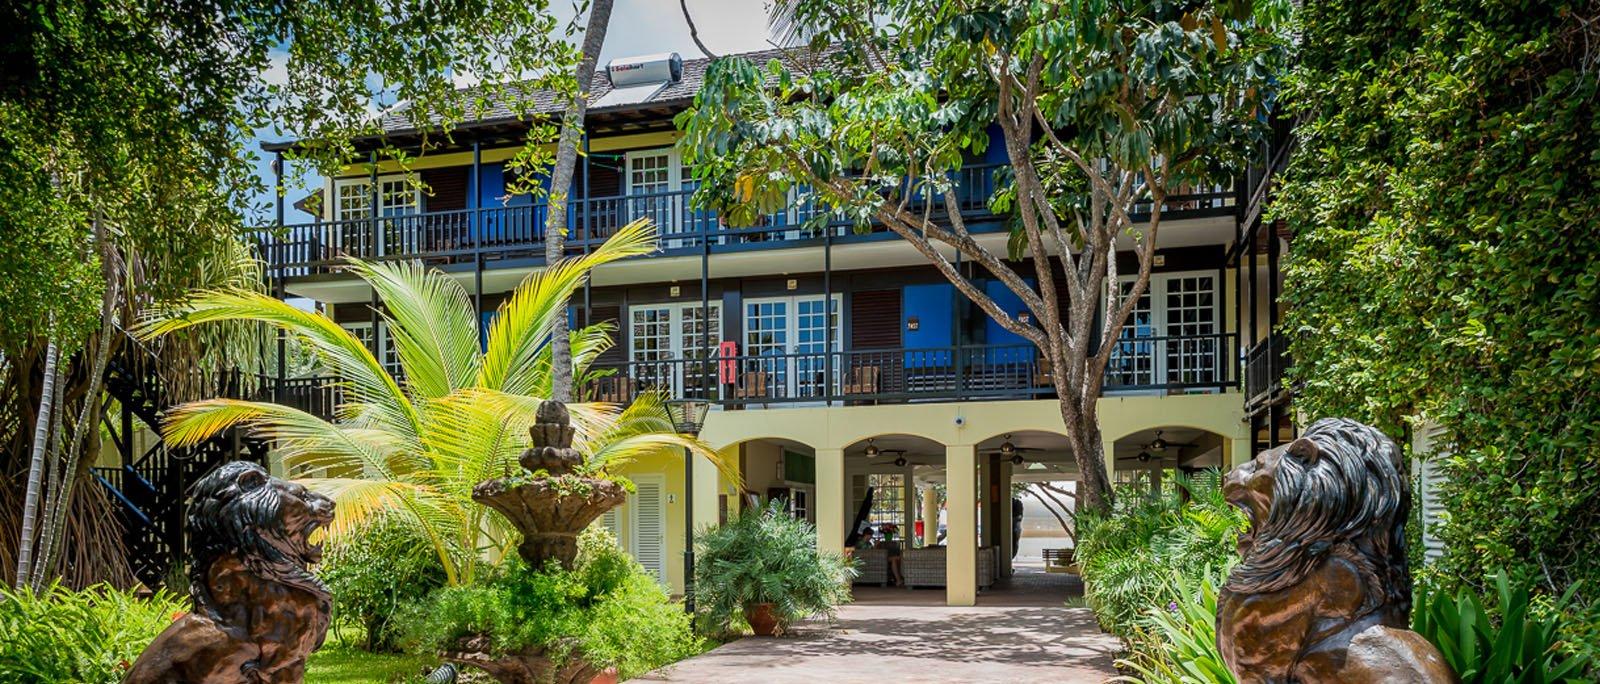 Lions dive hotel curacao - Lions dive hotel curacao ...